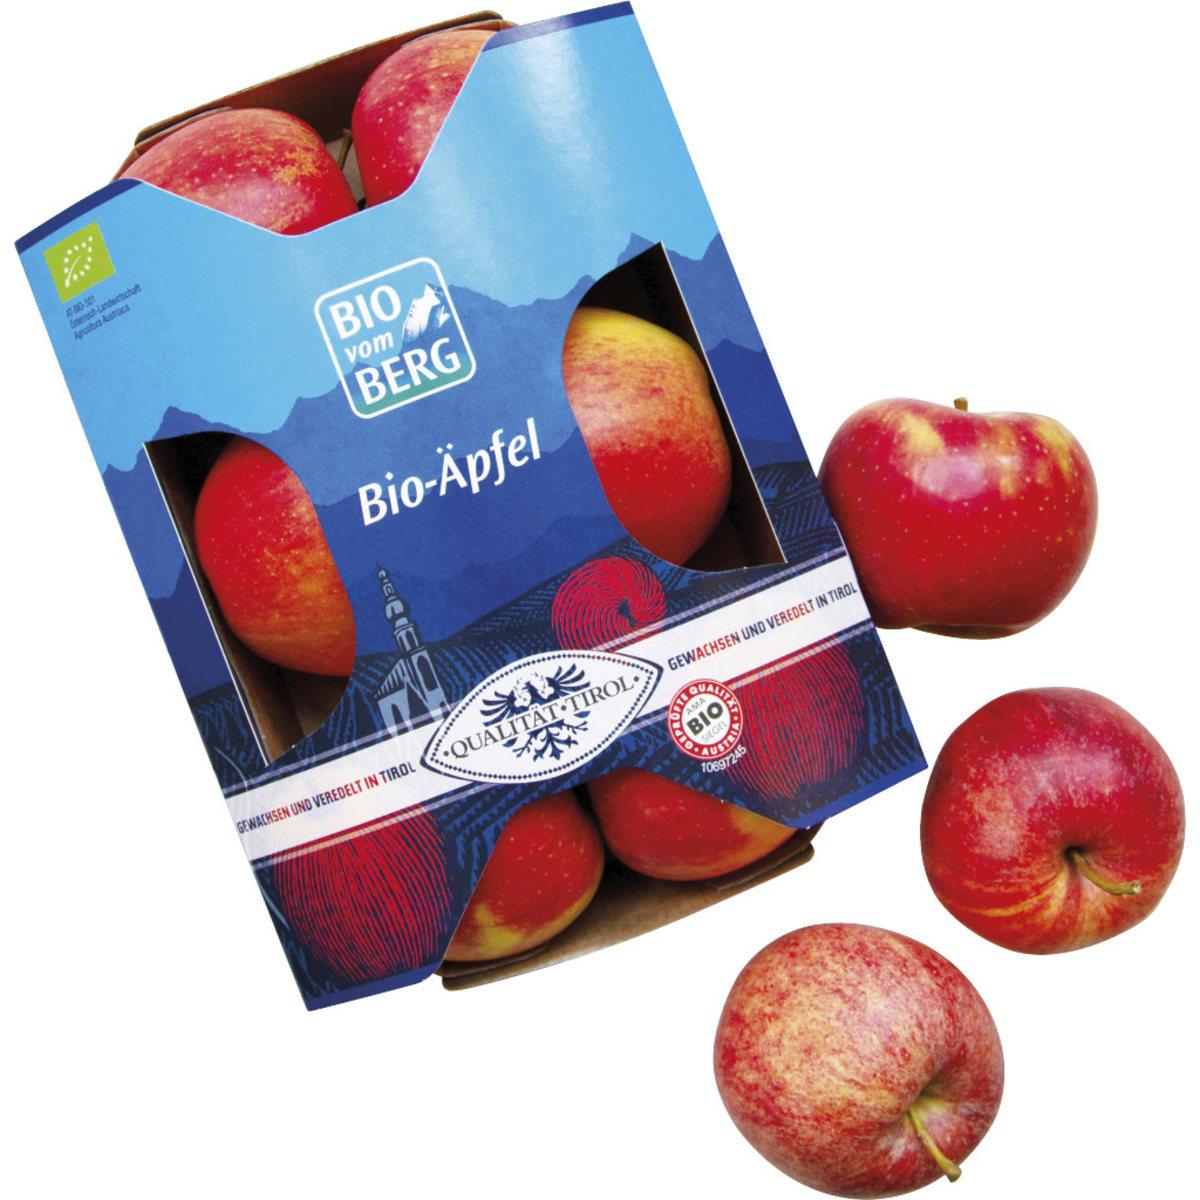 BIOvomBERG Äpfel Südtirol  ca 1kg